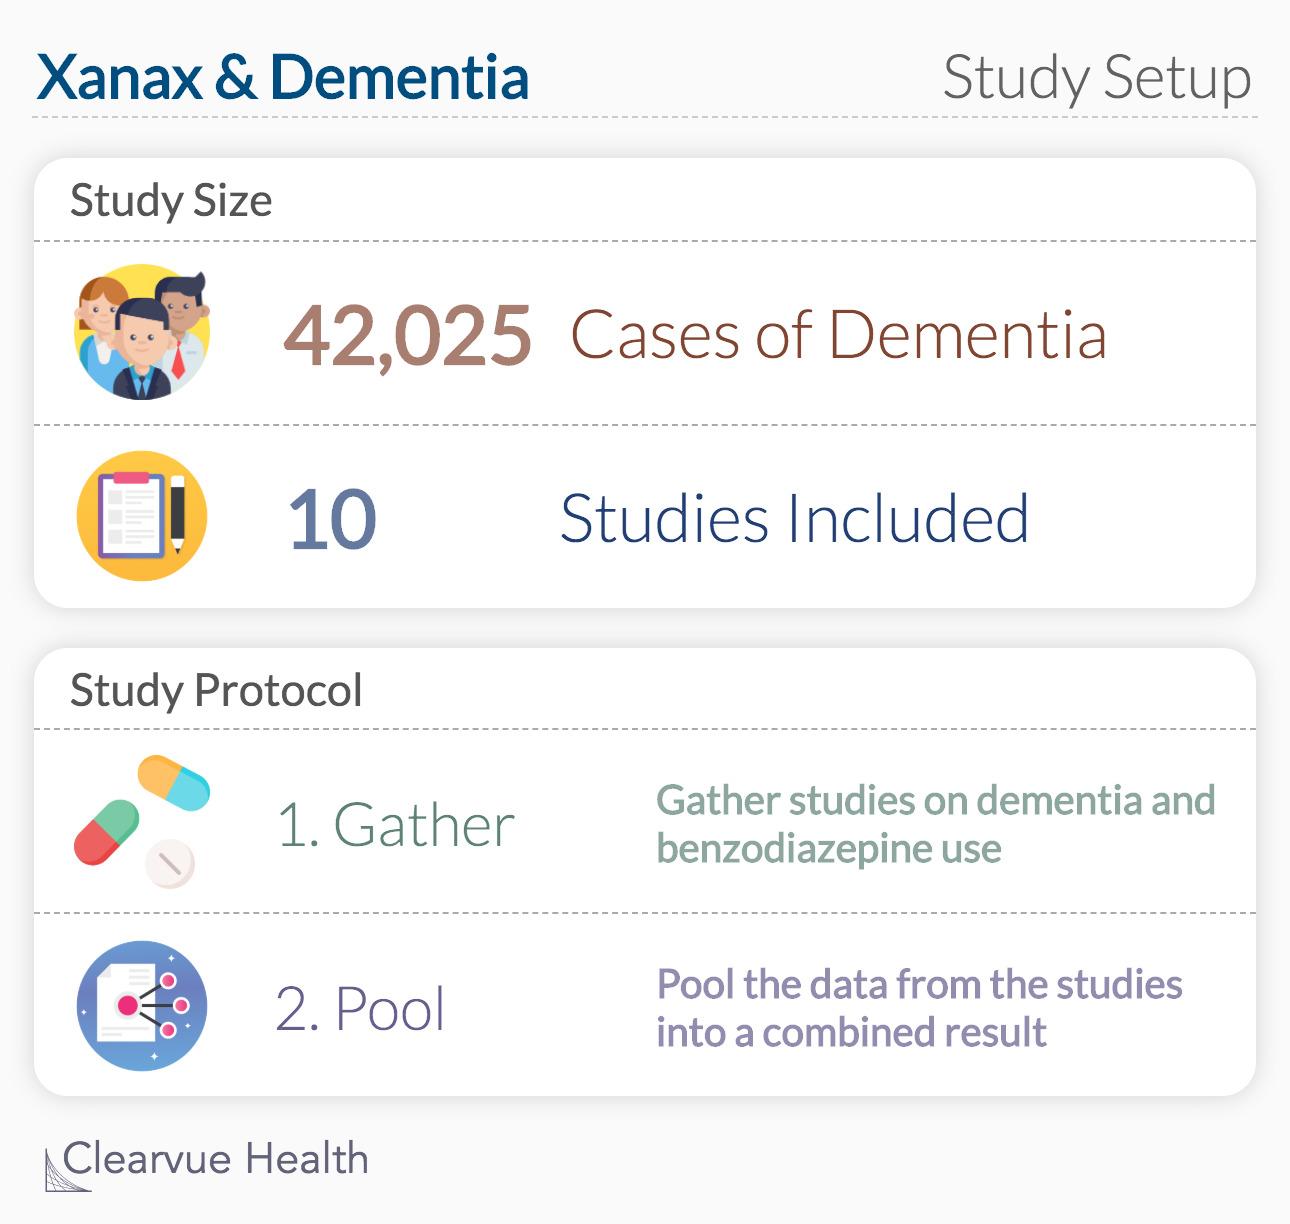 Xanax & Dementia: Study Setup